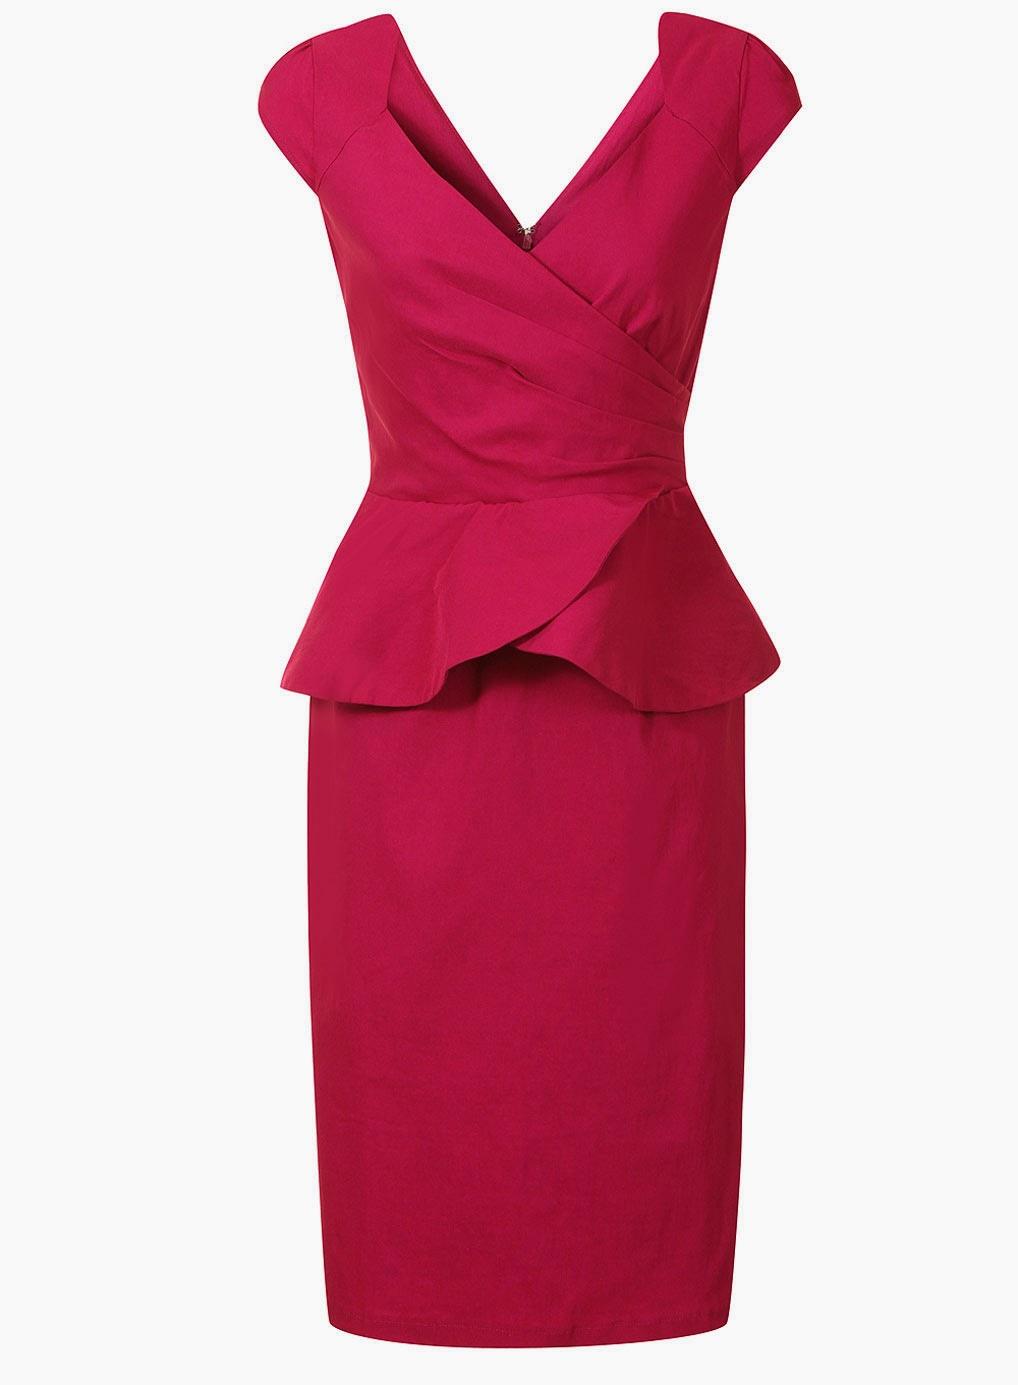 paperdolls pink dress